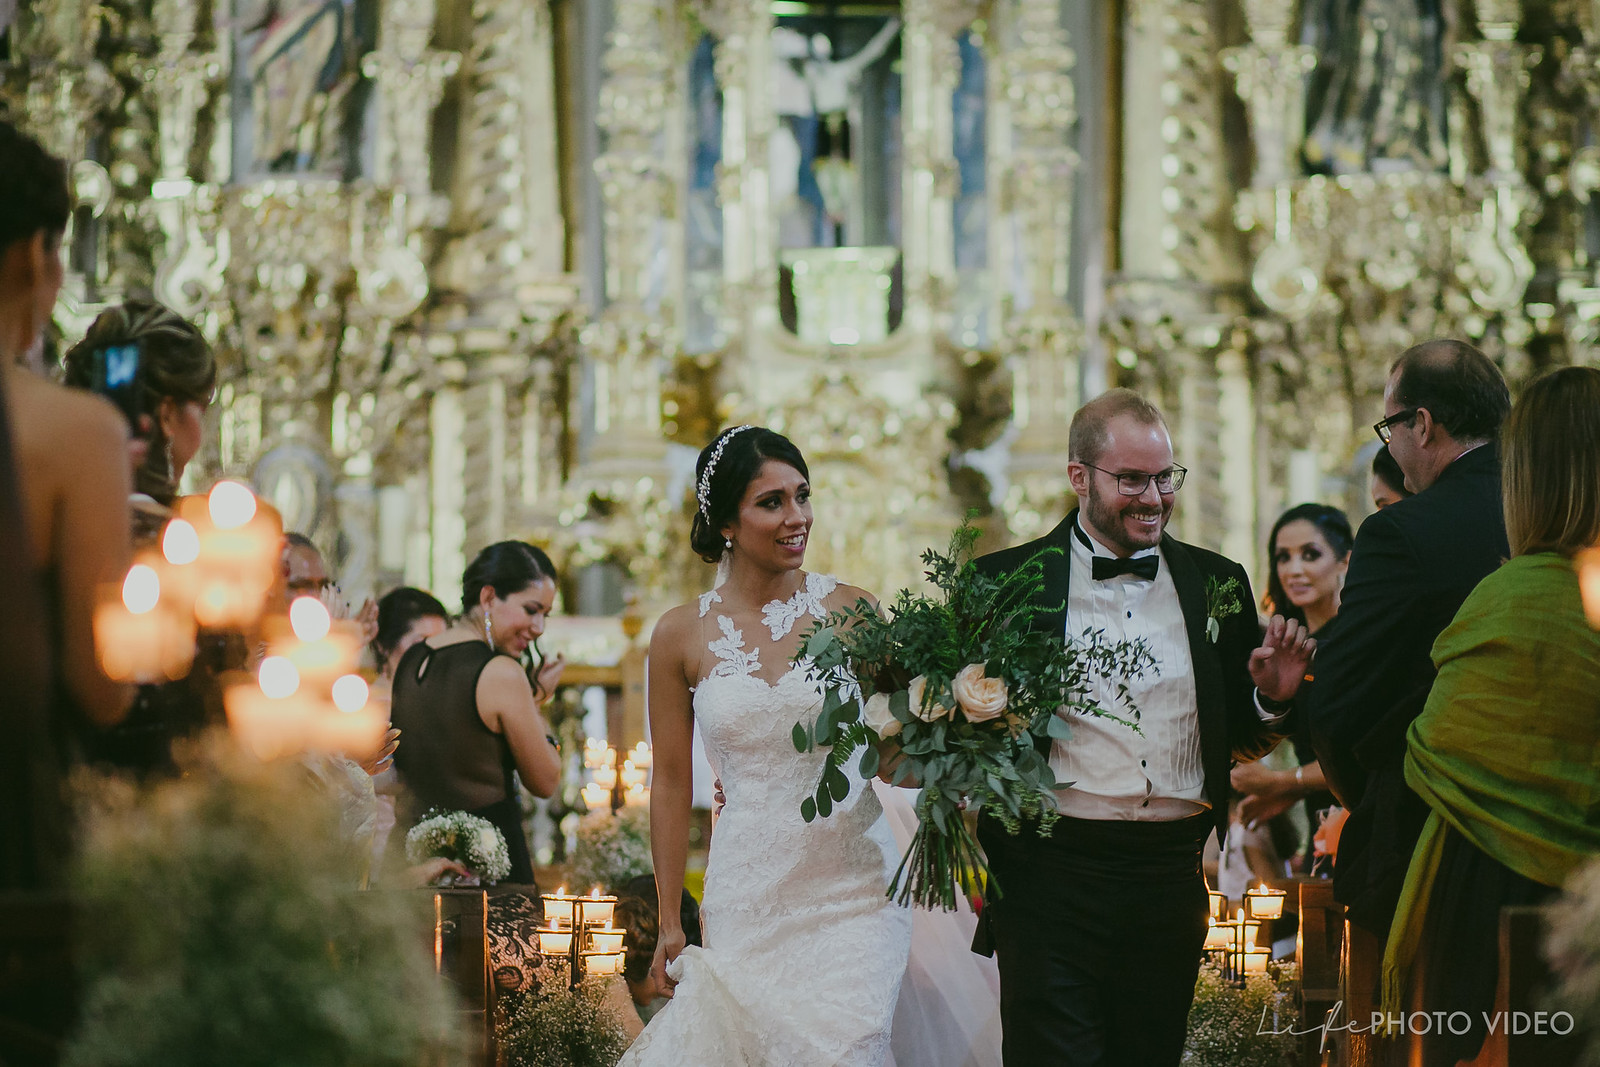 LifePhotoVideo_Boda_Guanajuato_Wedding_0047